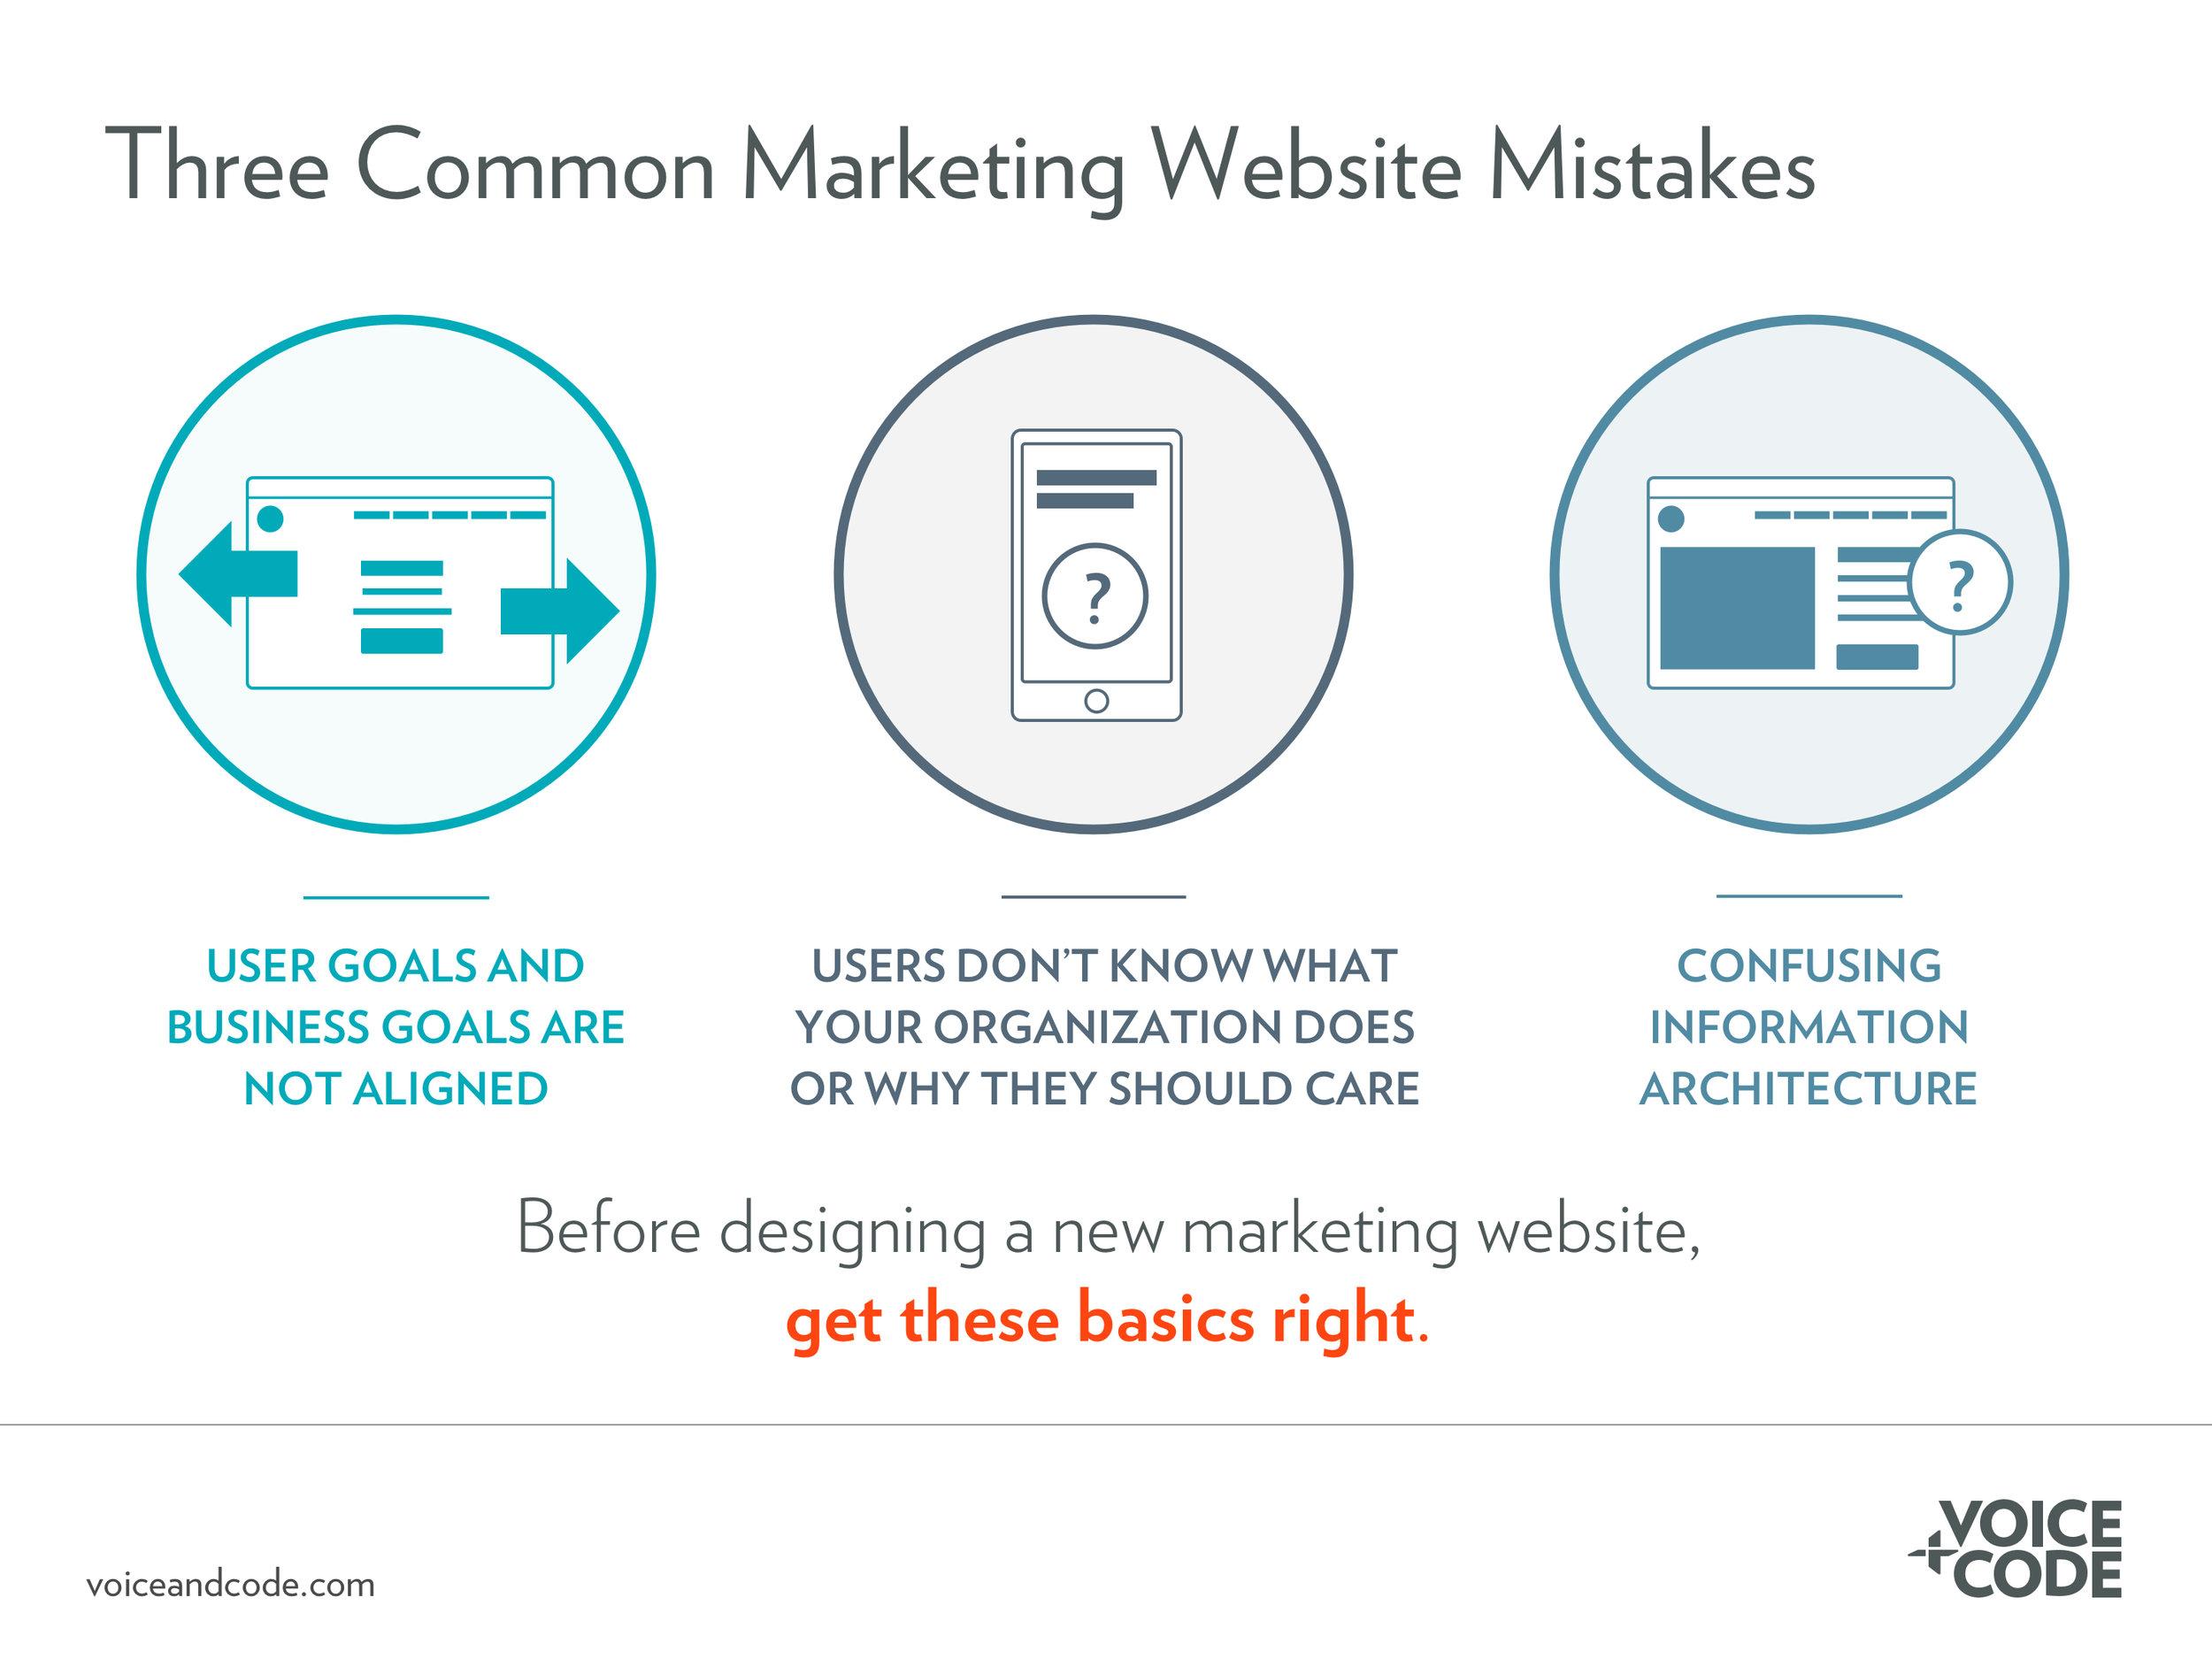 three-common-marketing-website-mistakes.jpg